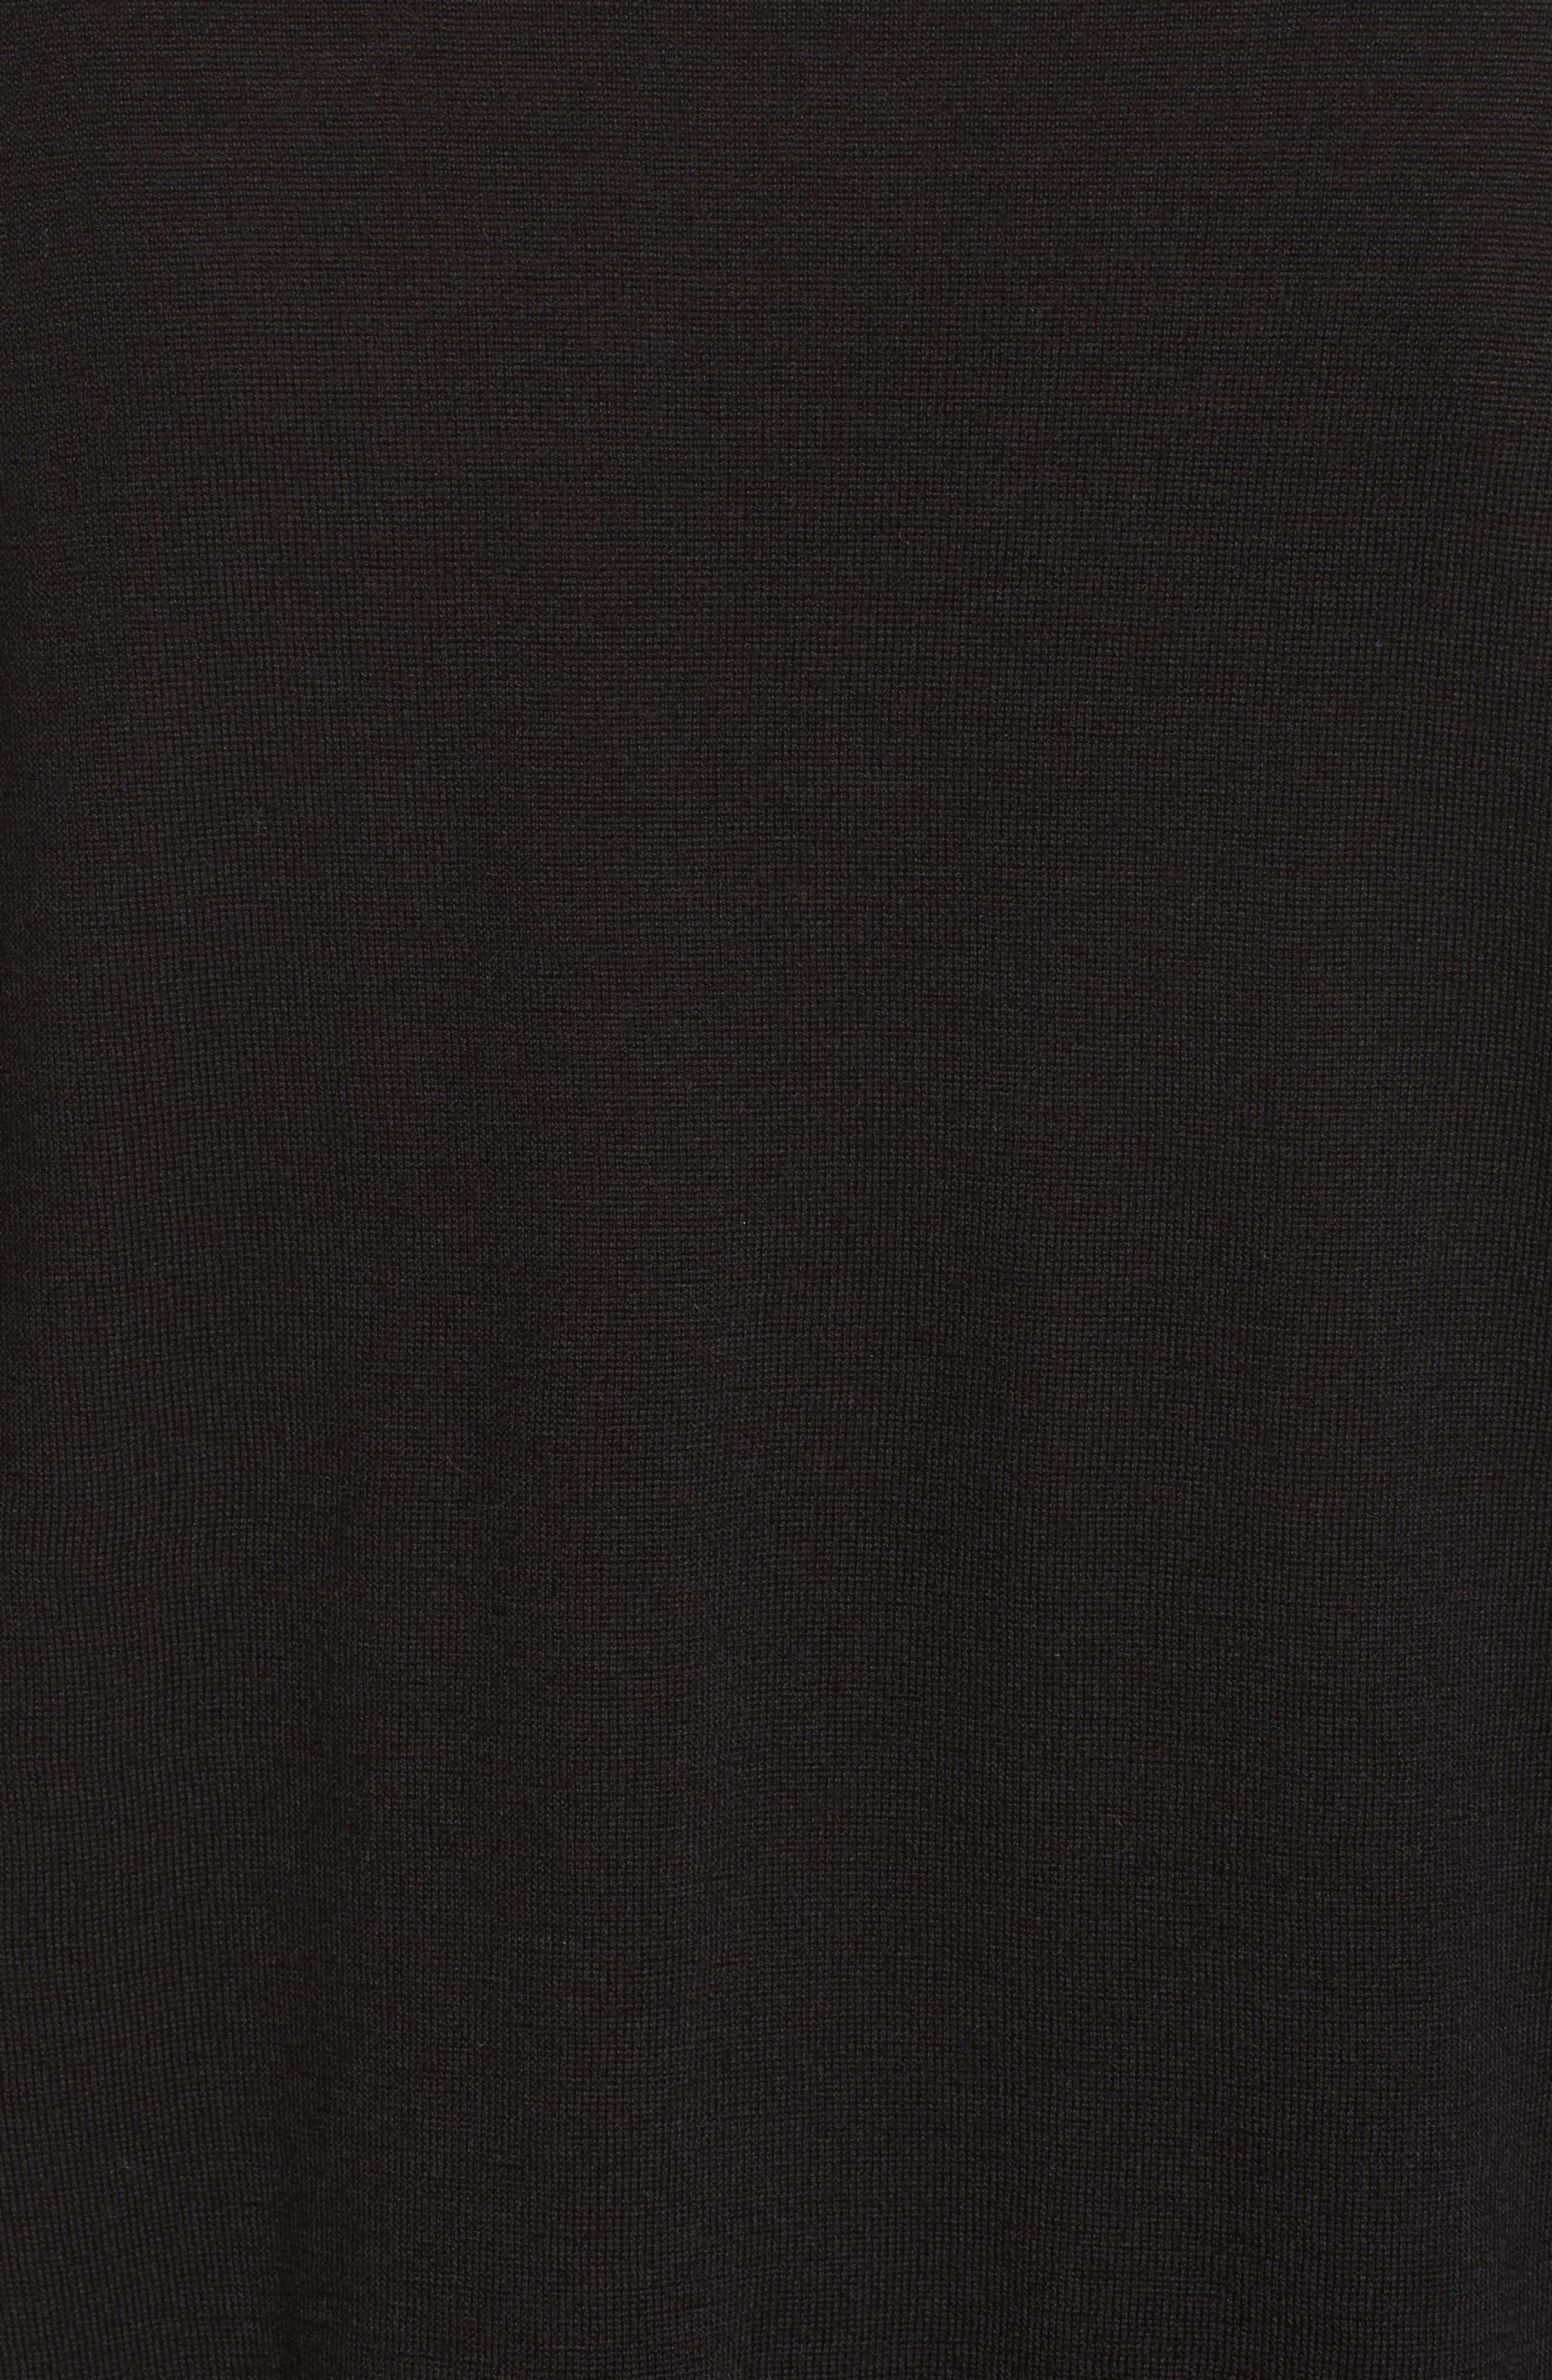 Asymmetrical Cowl Neck Sweater,                             Alternate thumbnail 6, color,                             Black